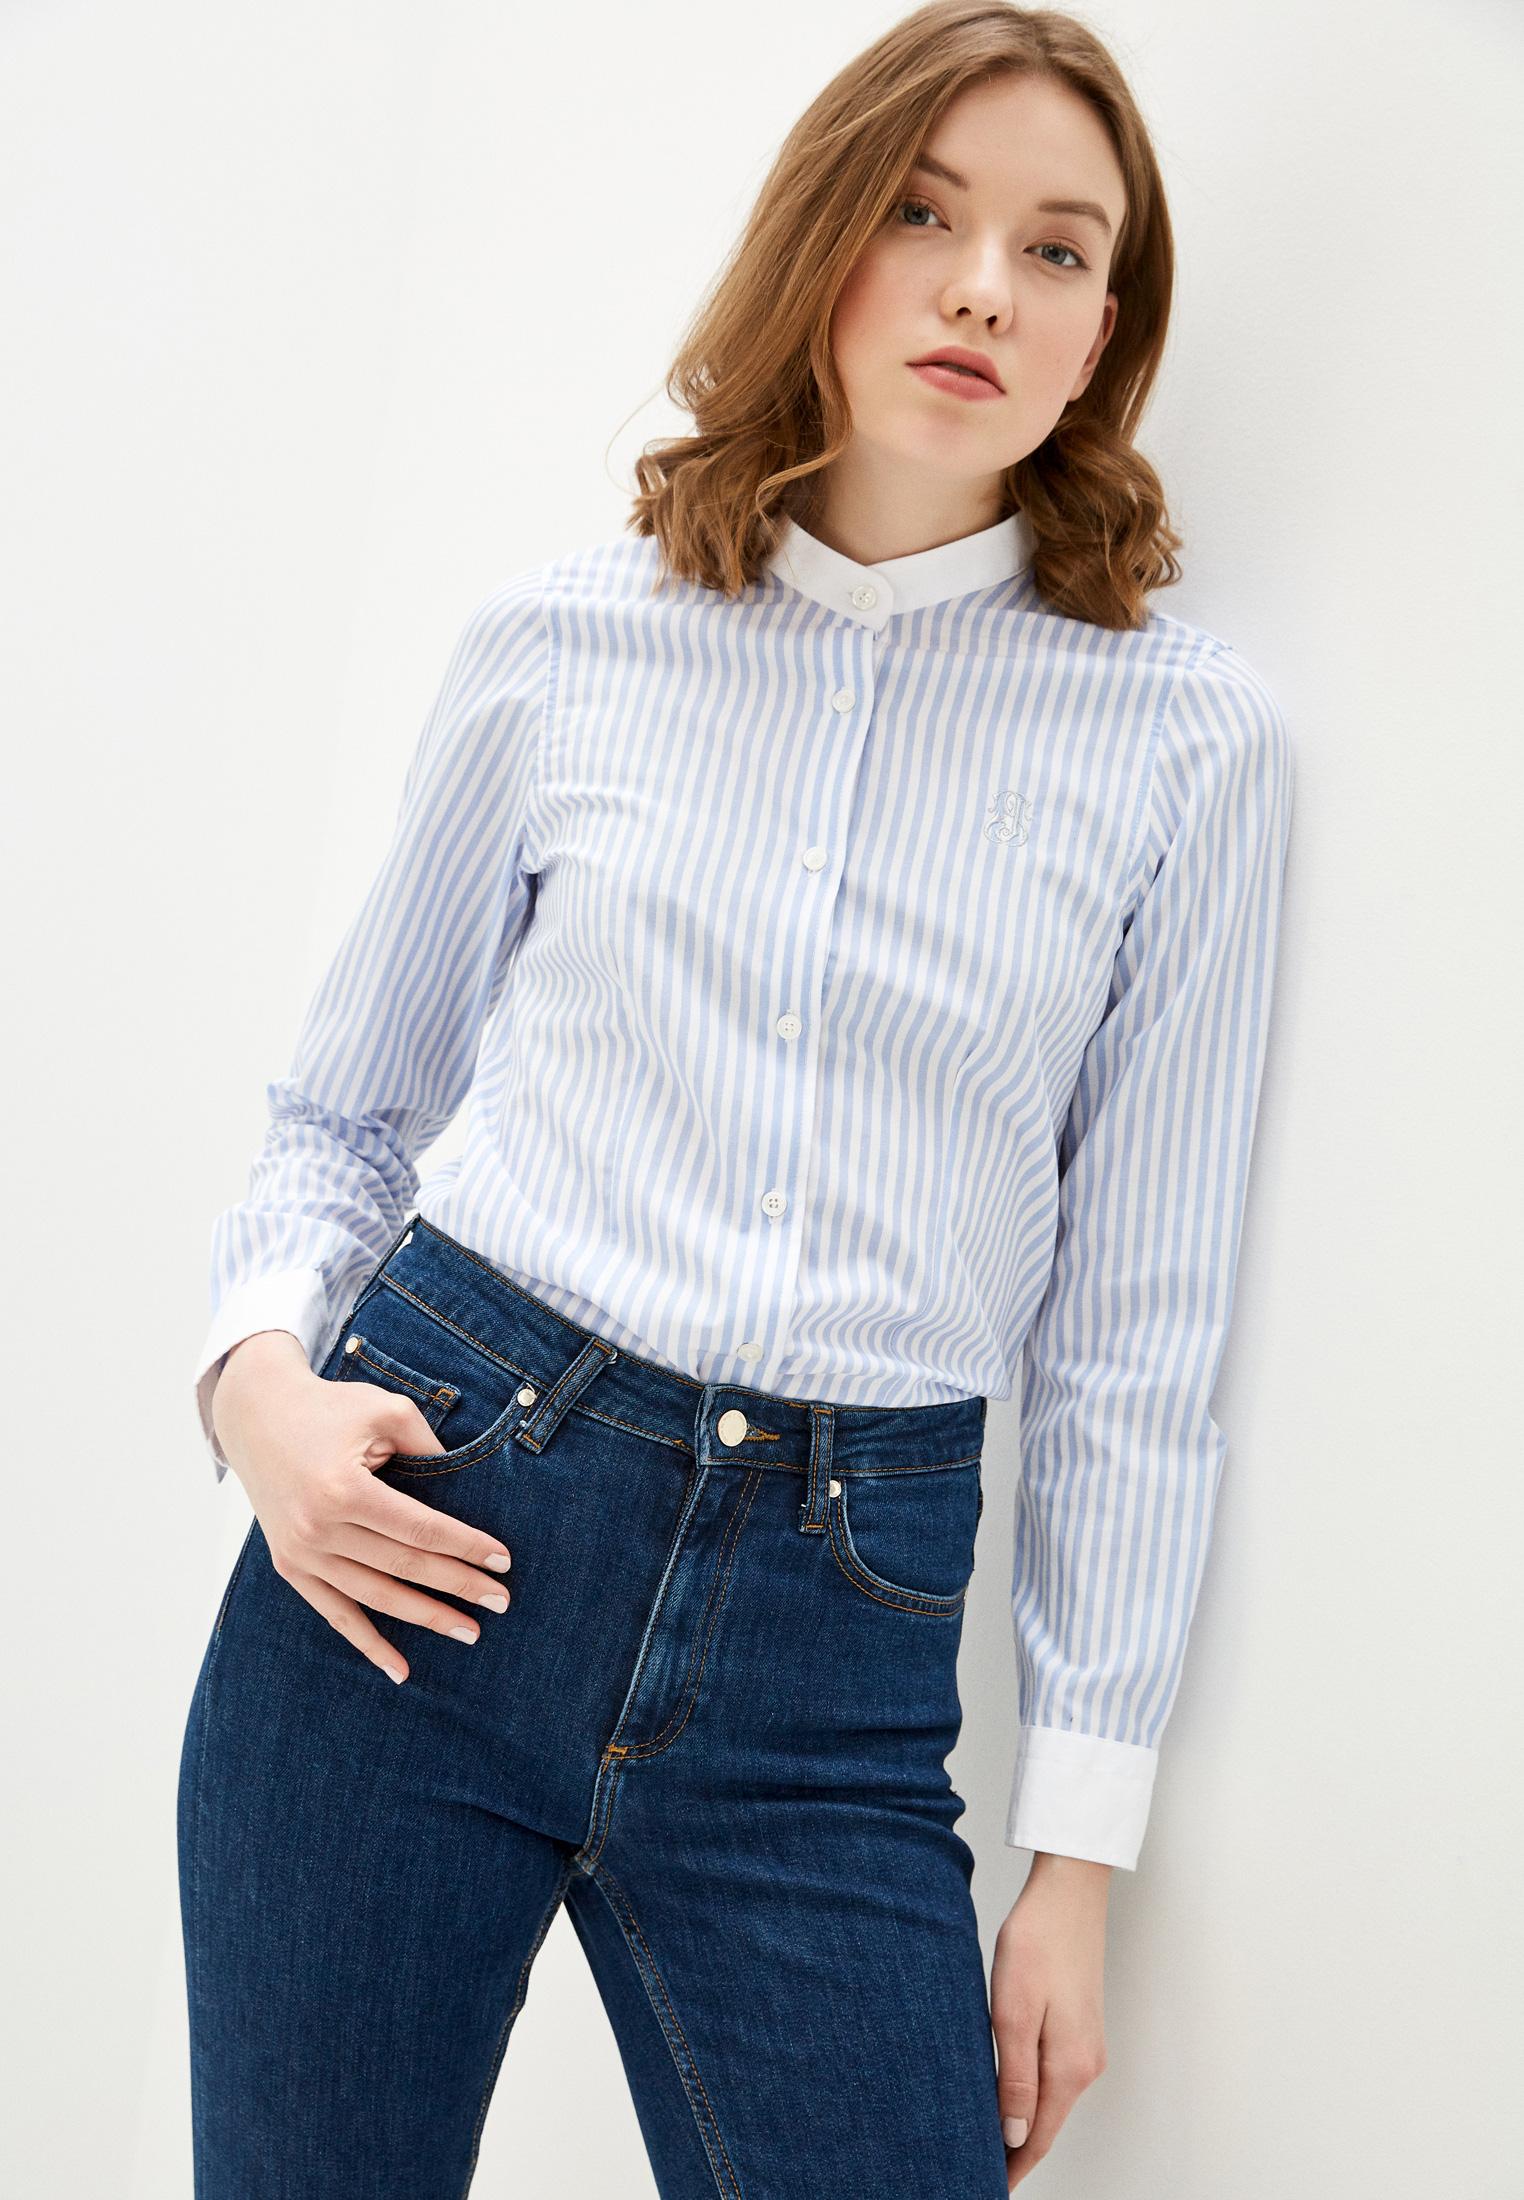 Женские рубашки с длинным рукавом JIMMY SANDERS (Джимми Сандерс) 19S SHW4035 BABY BLUE